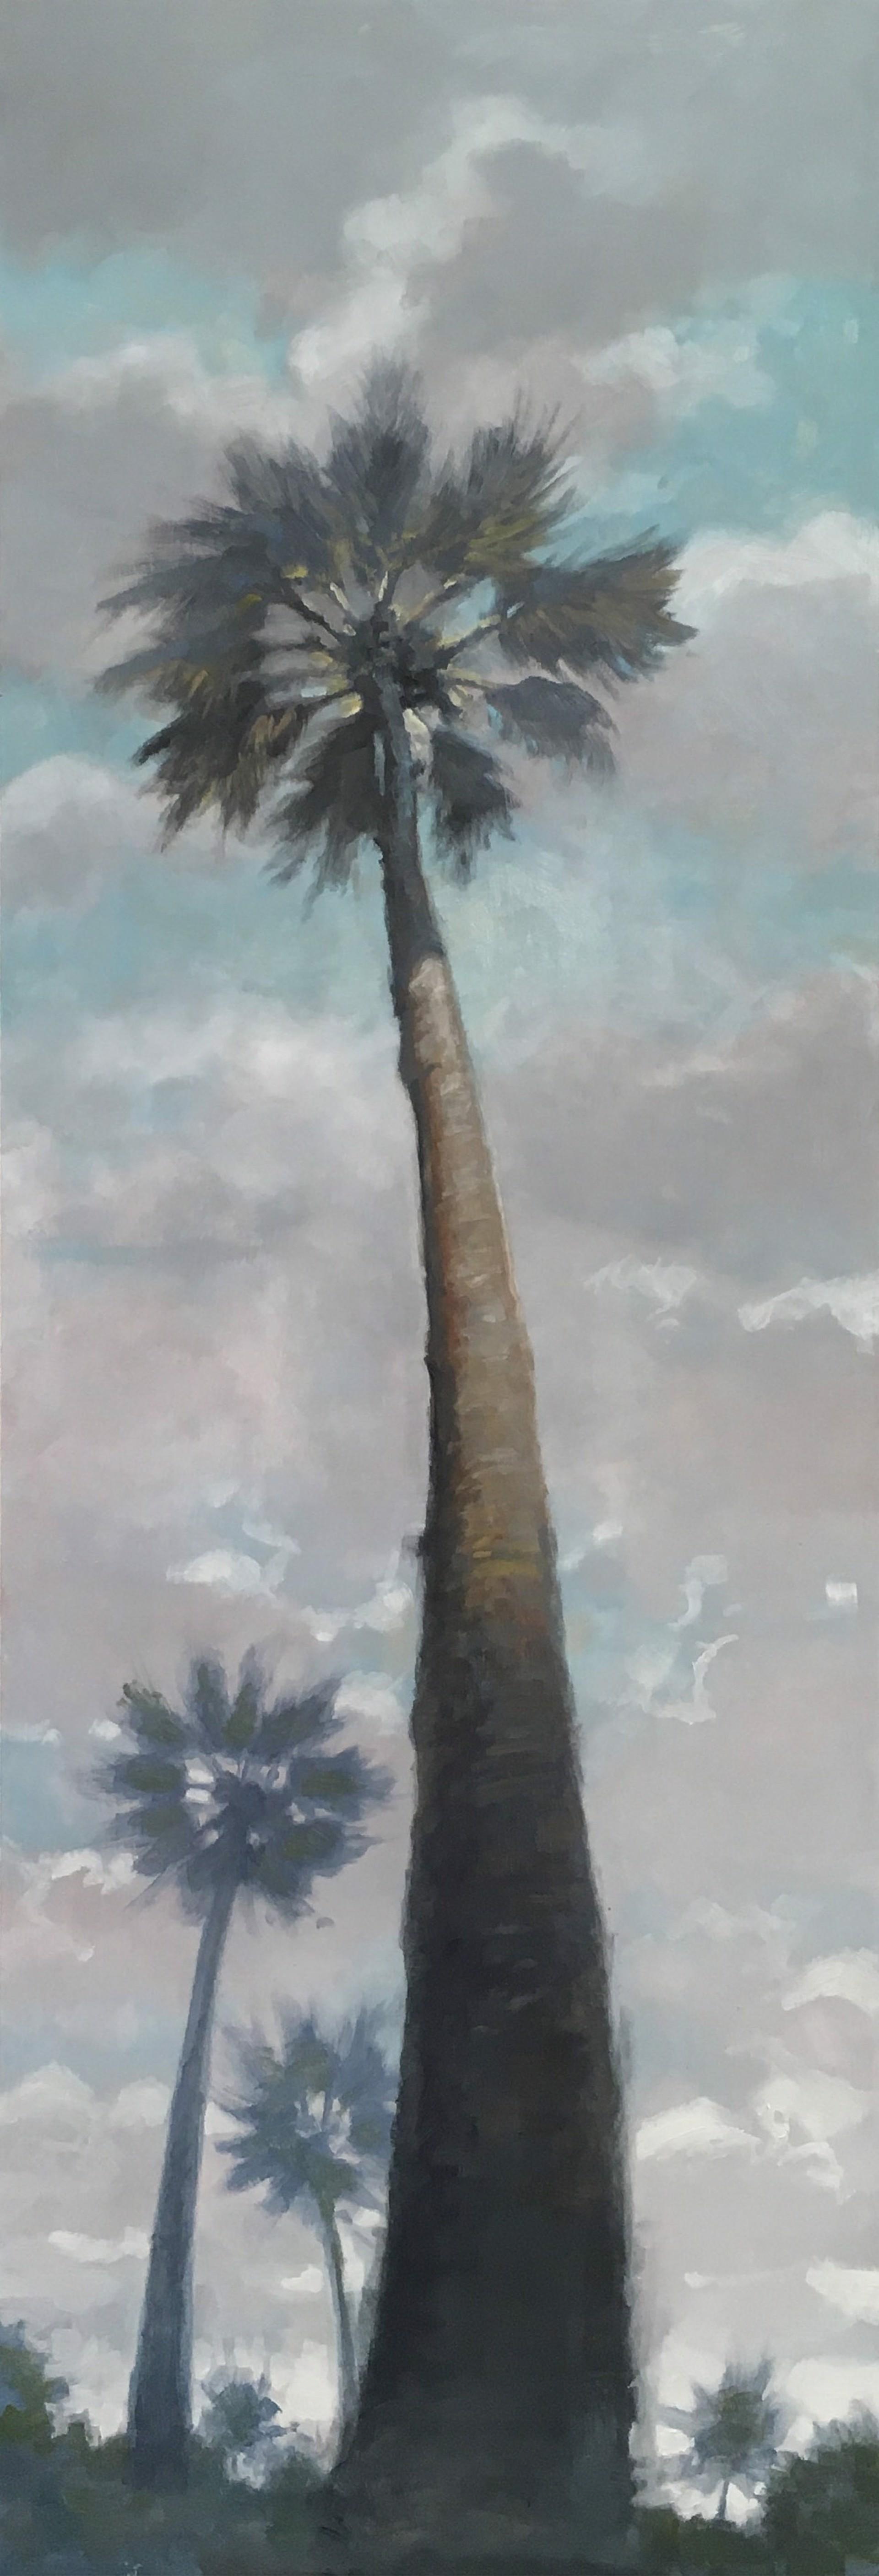 A Soft Breeze by Steven Walker